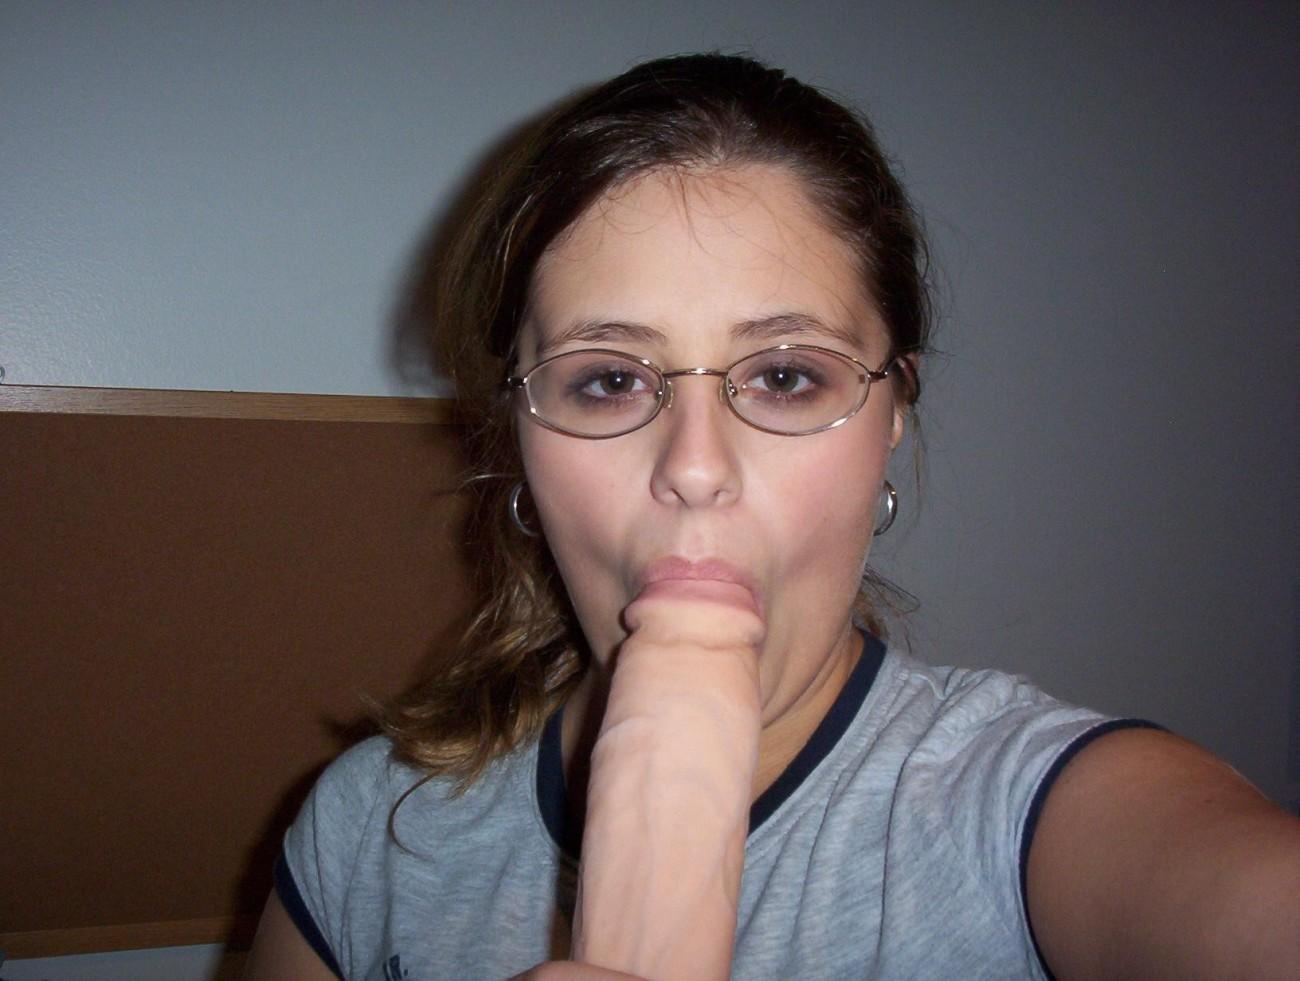 Sexy nerd glasses blowjob